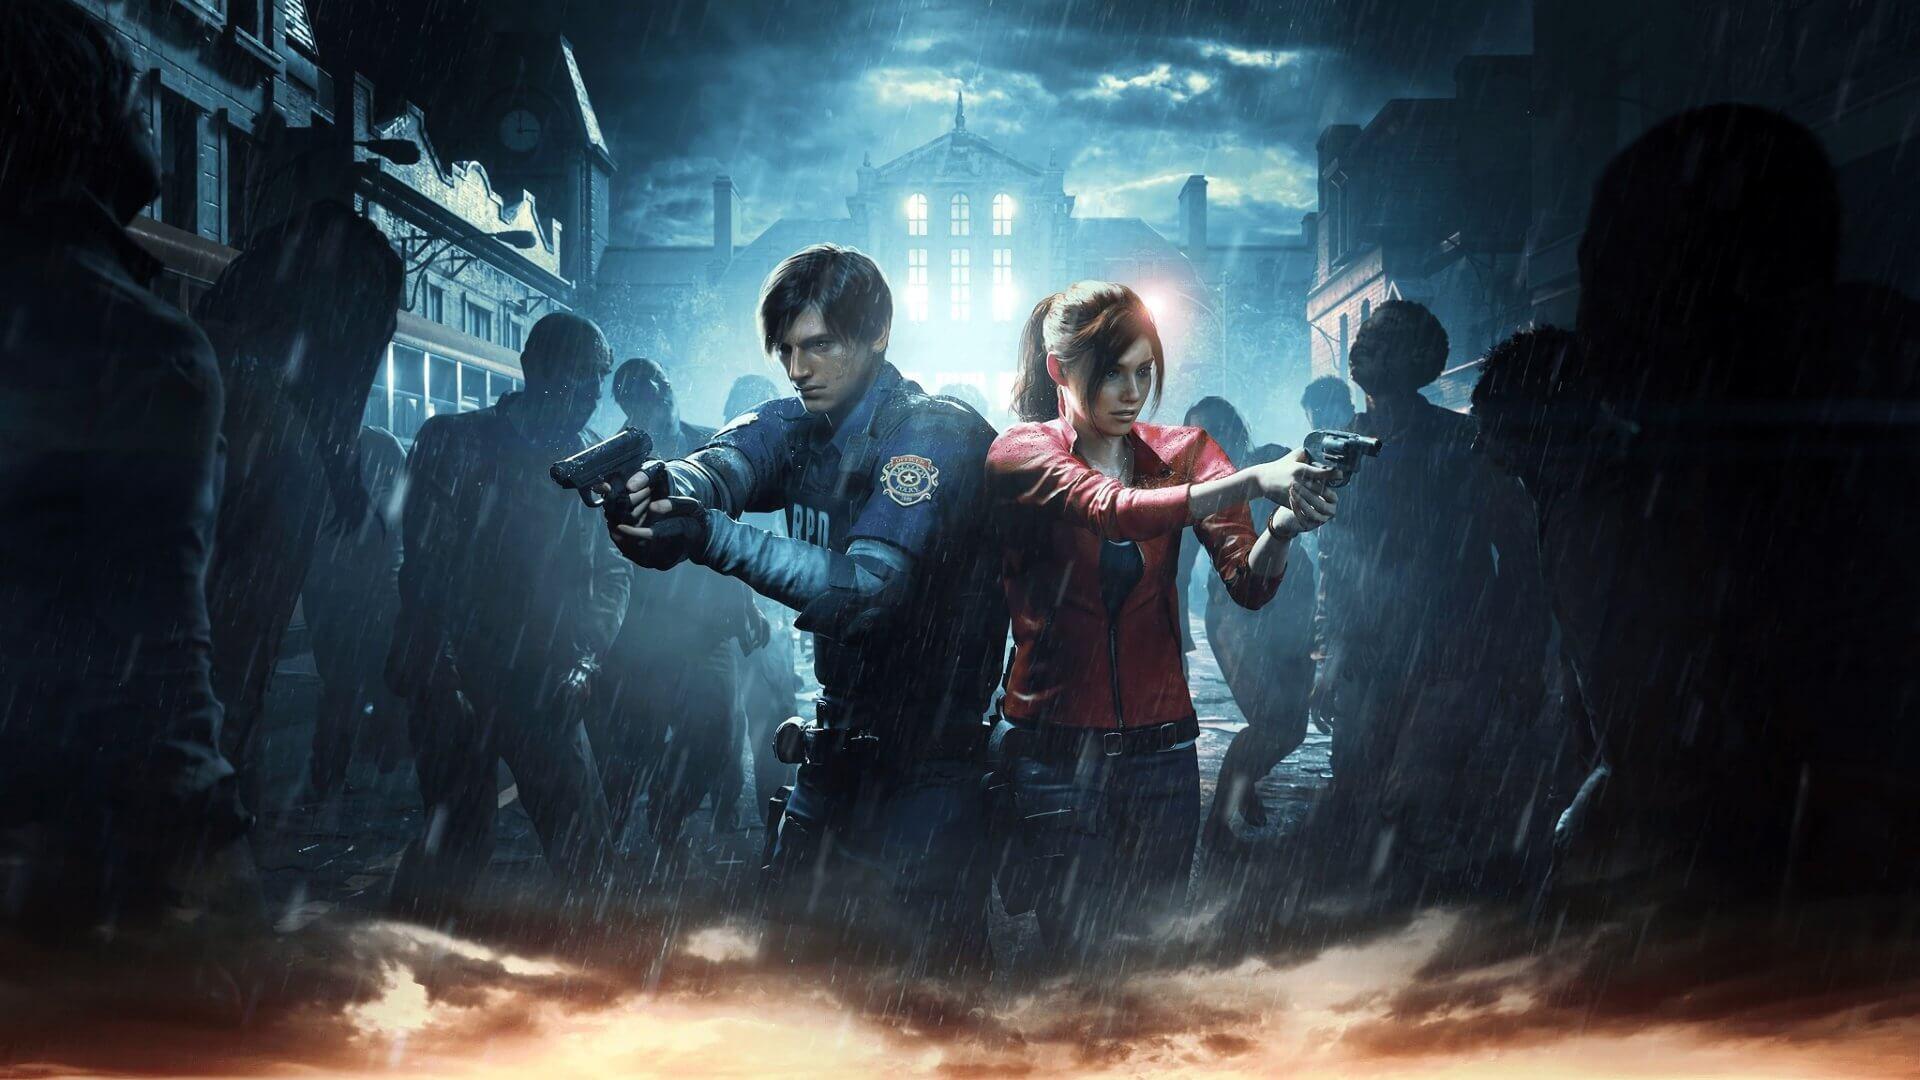 Resident Evil 2 Remake было продано 6,5 млн. копий, Resident Evil 3 Remake 2,5 млн., Monster Hunter World - 15,5 млн